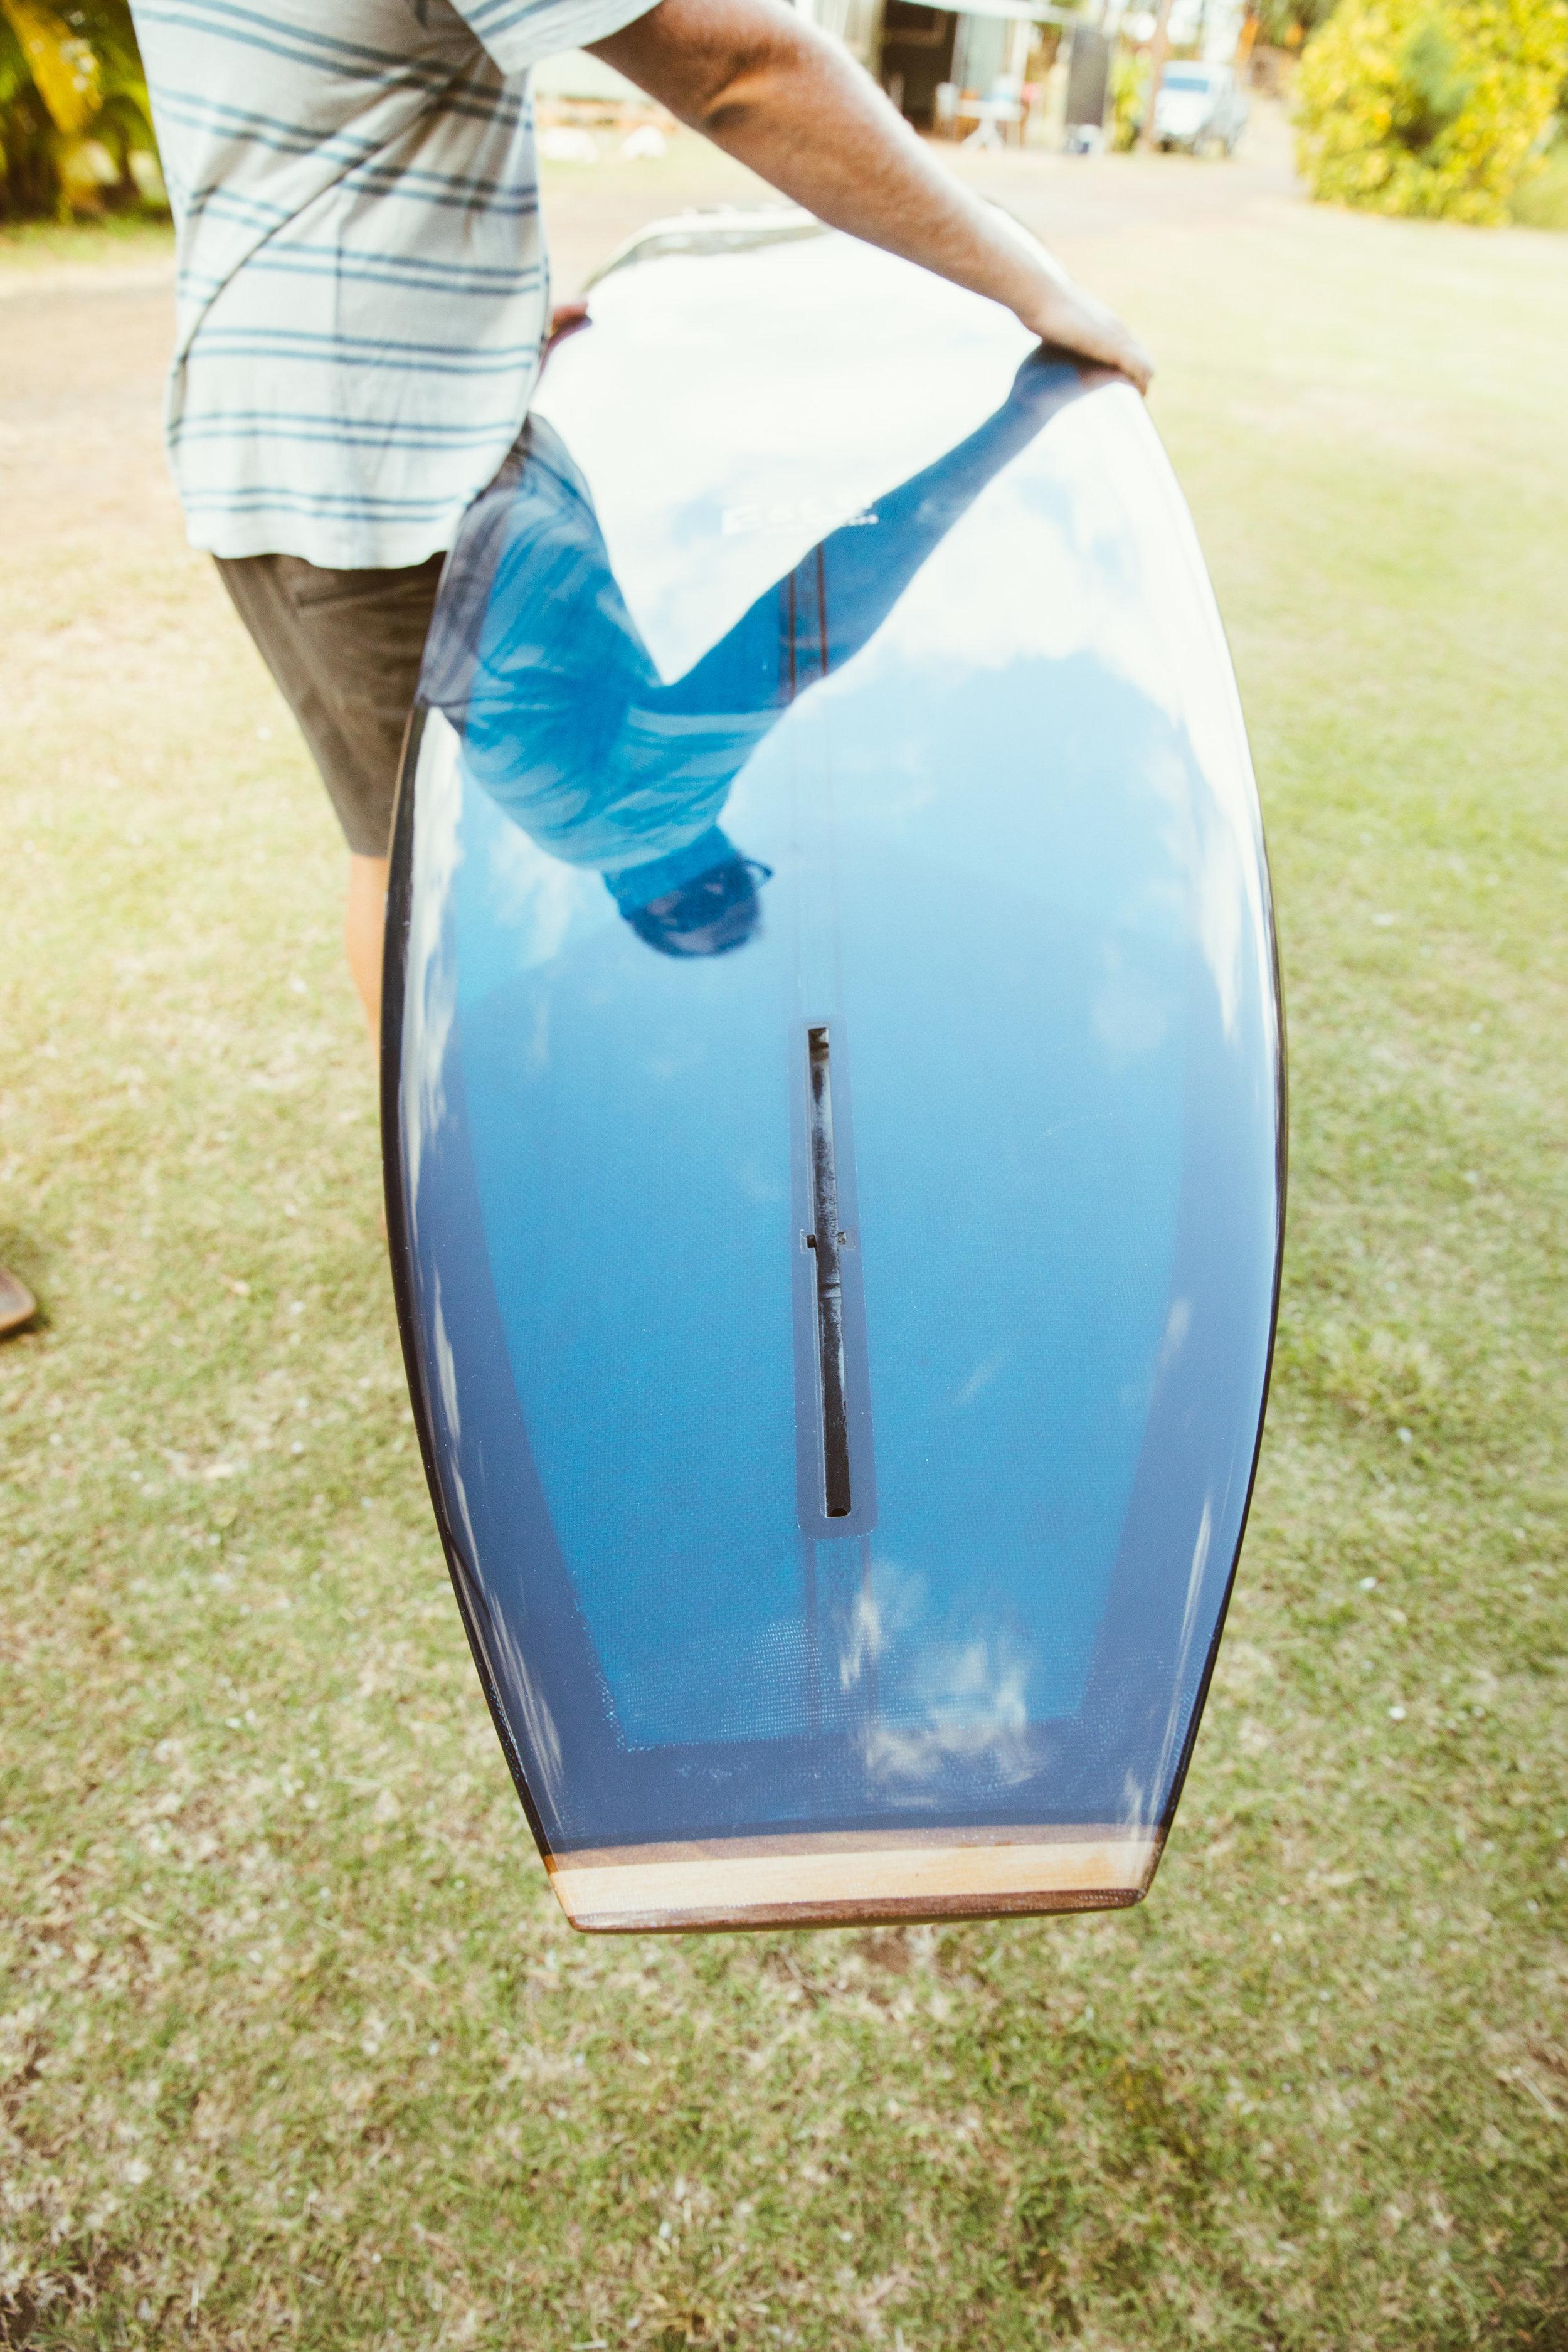 bryce johnson-photography-ebert surfboards-kauai-34.jpg